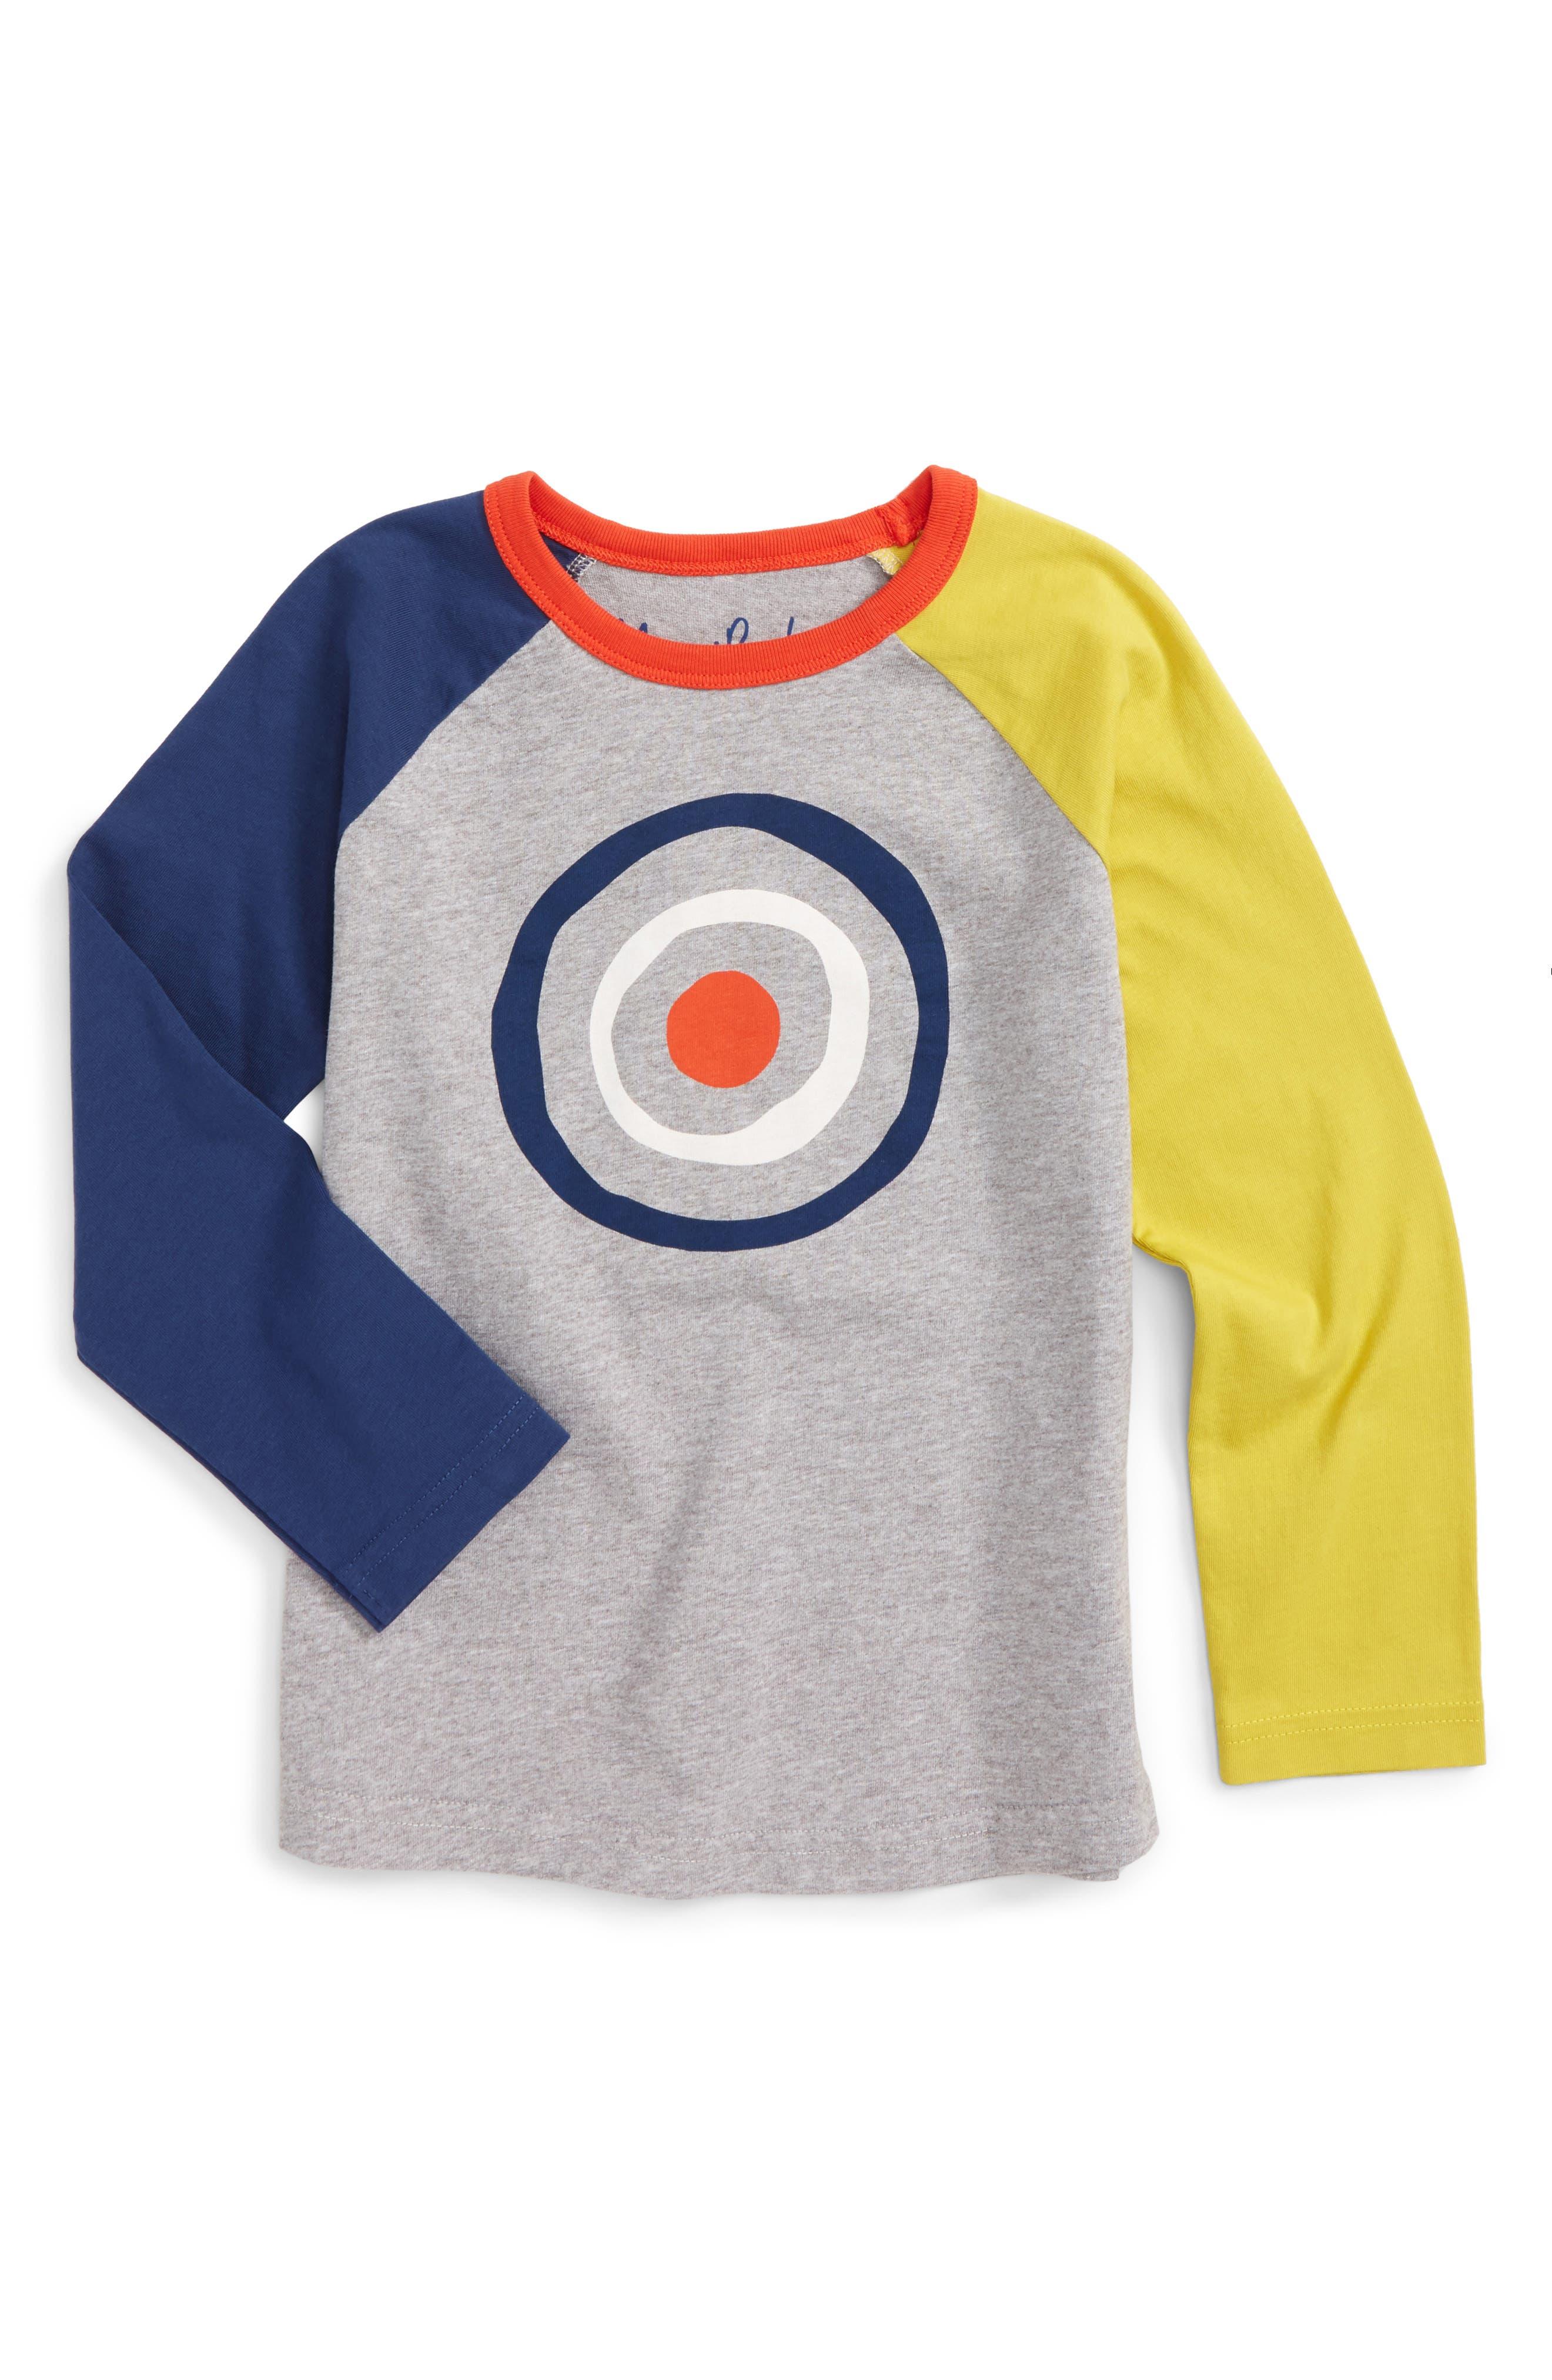 Main Image - Mini Boden Hotchpotch T-Shirt (Toddler Boys, Little Boys & Big Boys)